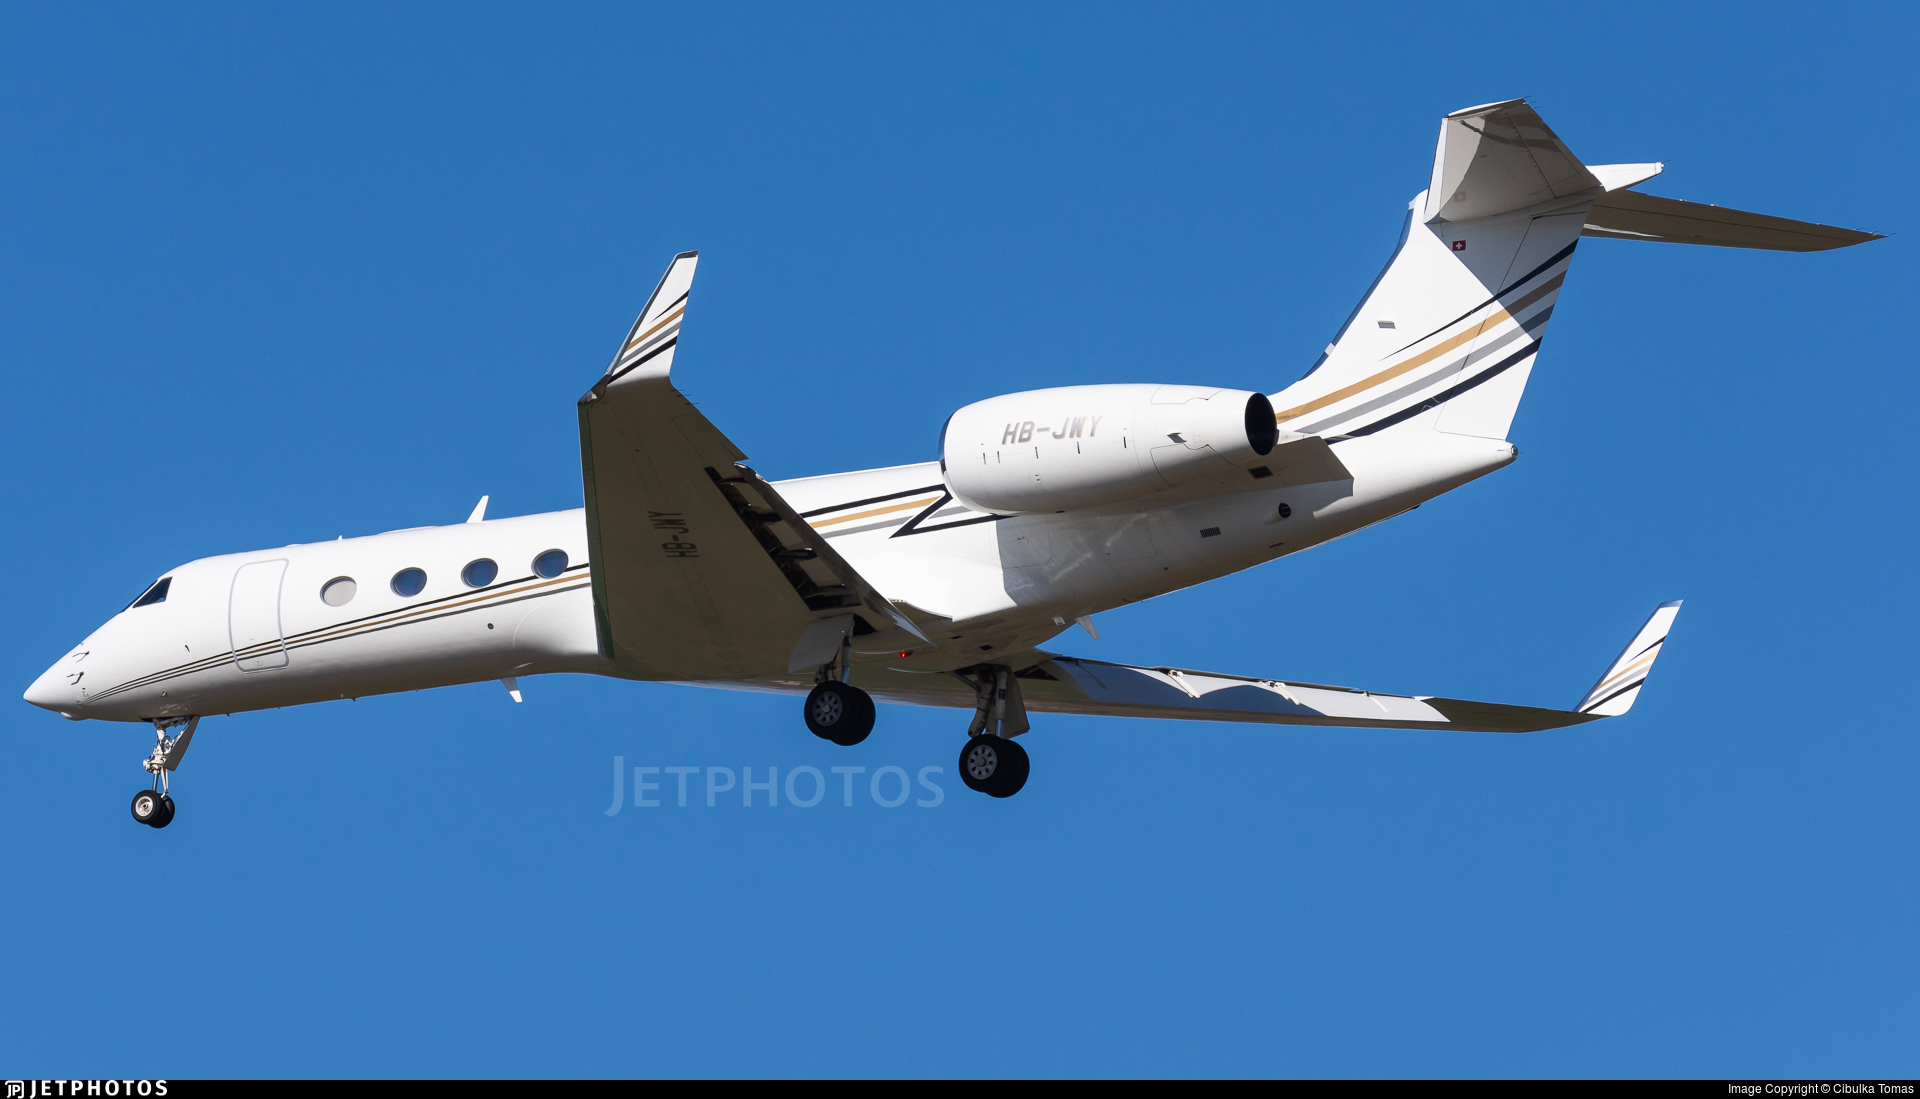 HB-JWY - Gulfstream G550 - Premium Jet